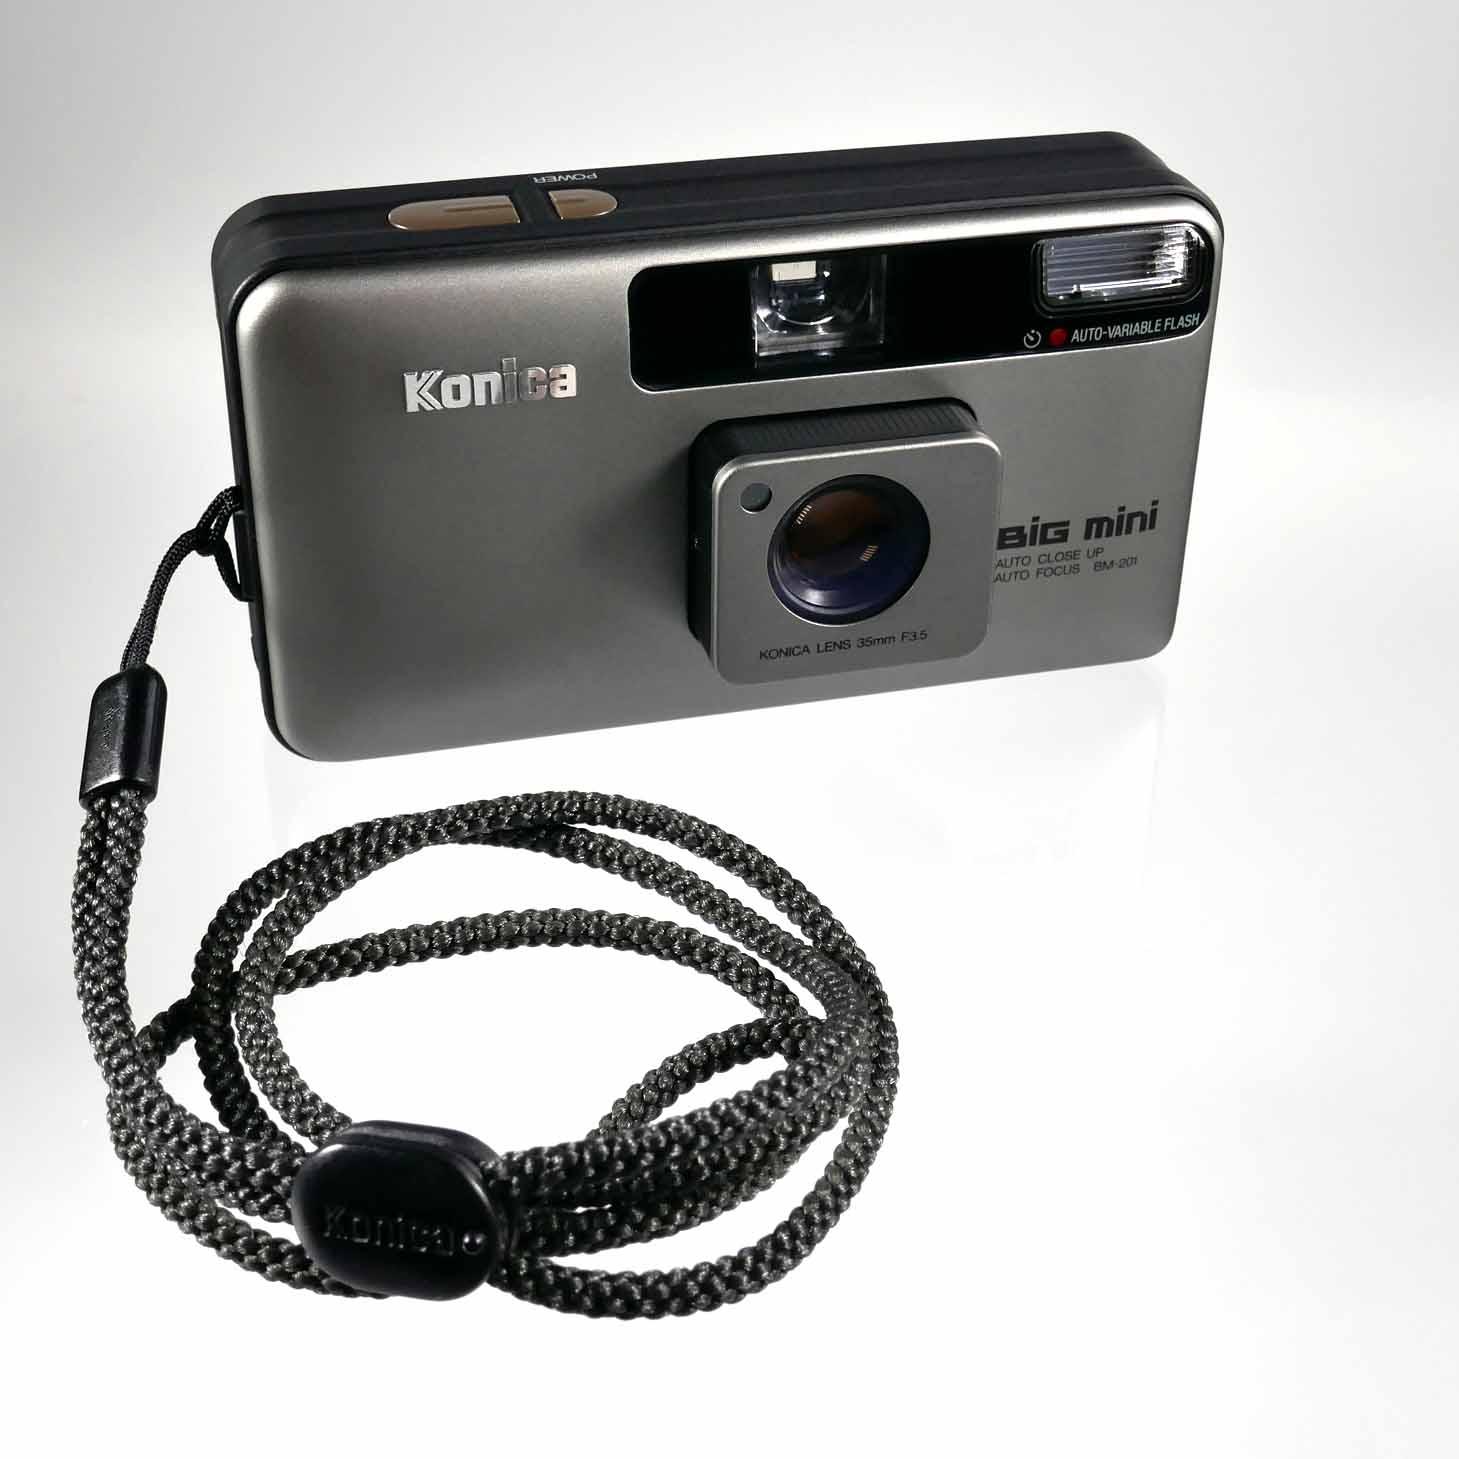 clean-cameras-Konica-Big.mini-06